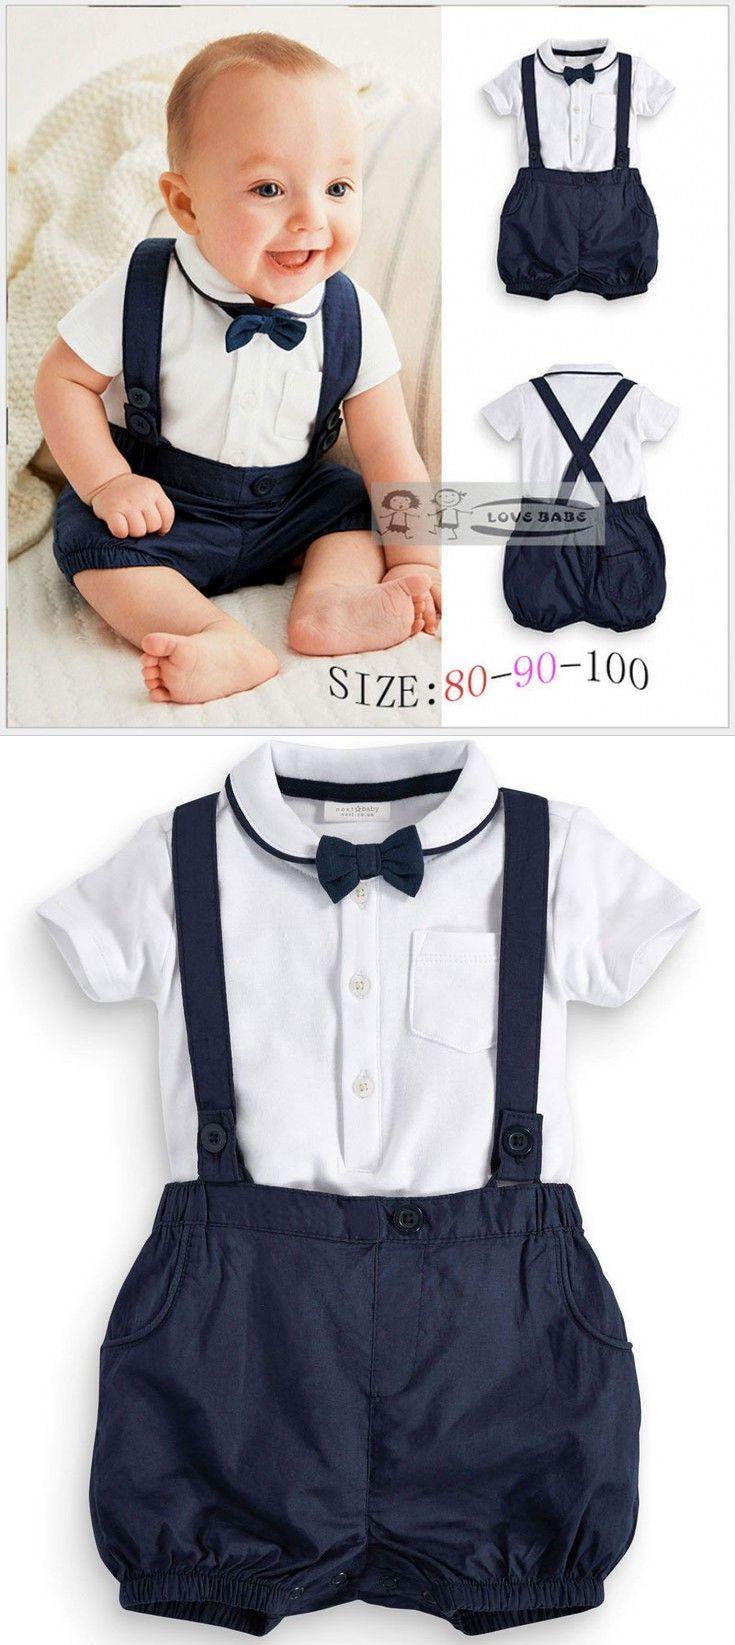 Baby Clothing Summer Baby Clothing Cotton 2pcs Suit Short Infant Boy Gentleman Suspender Gift Erkek Bebek Giysileri Erkek Bebek Modasi Erkek Bebek